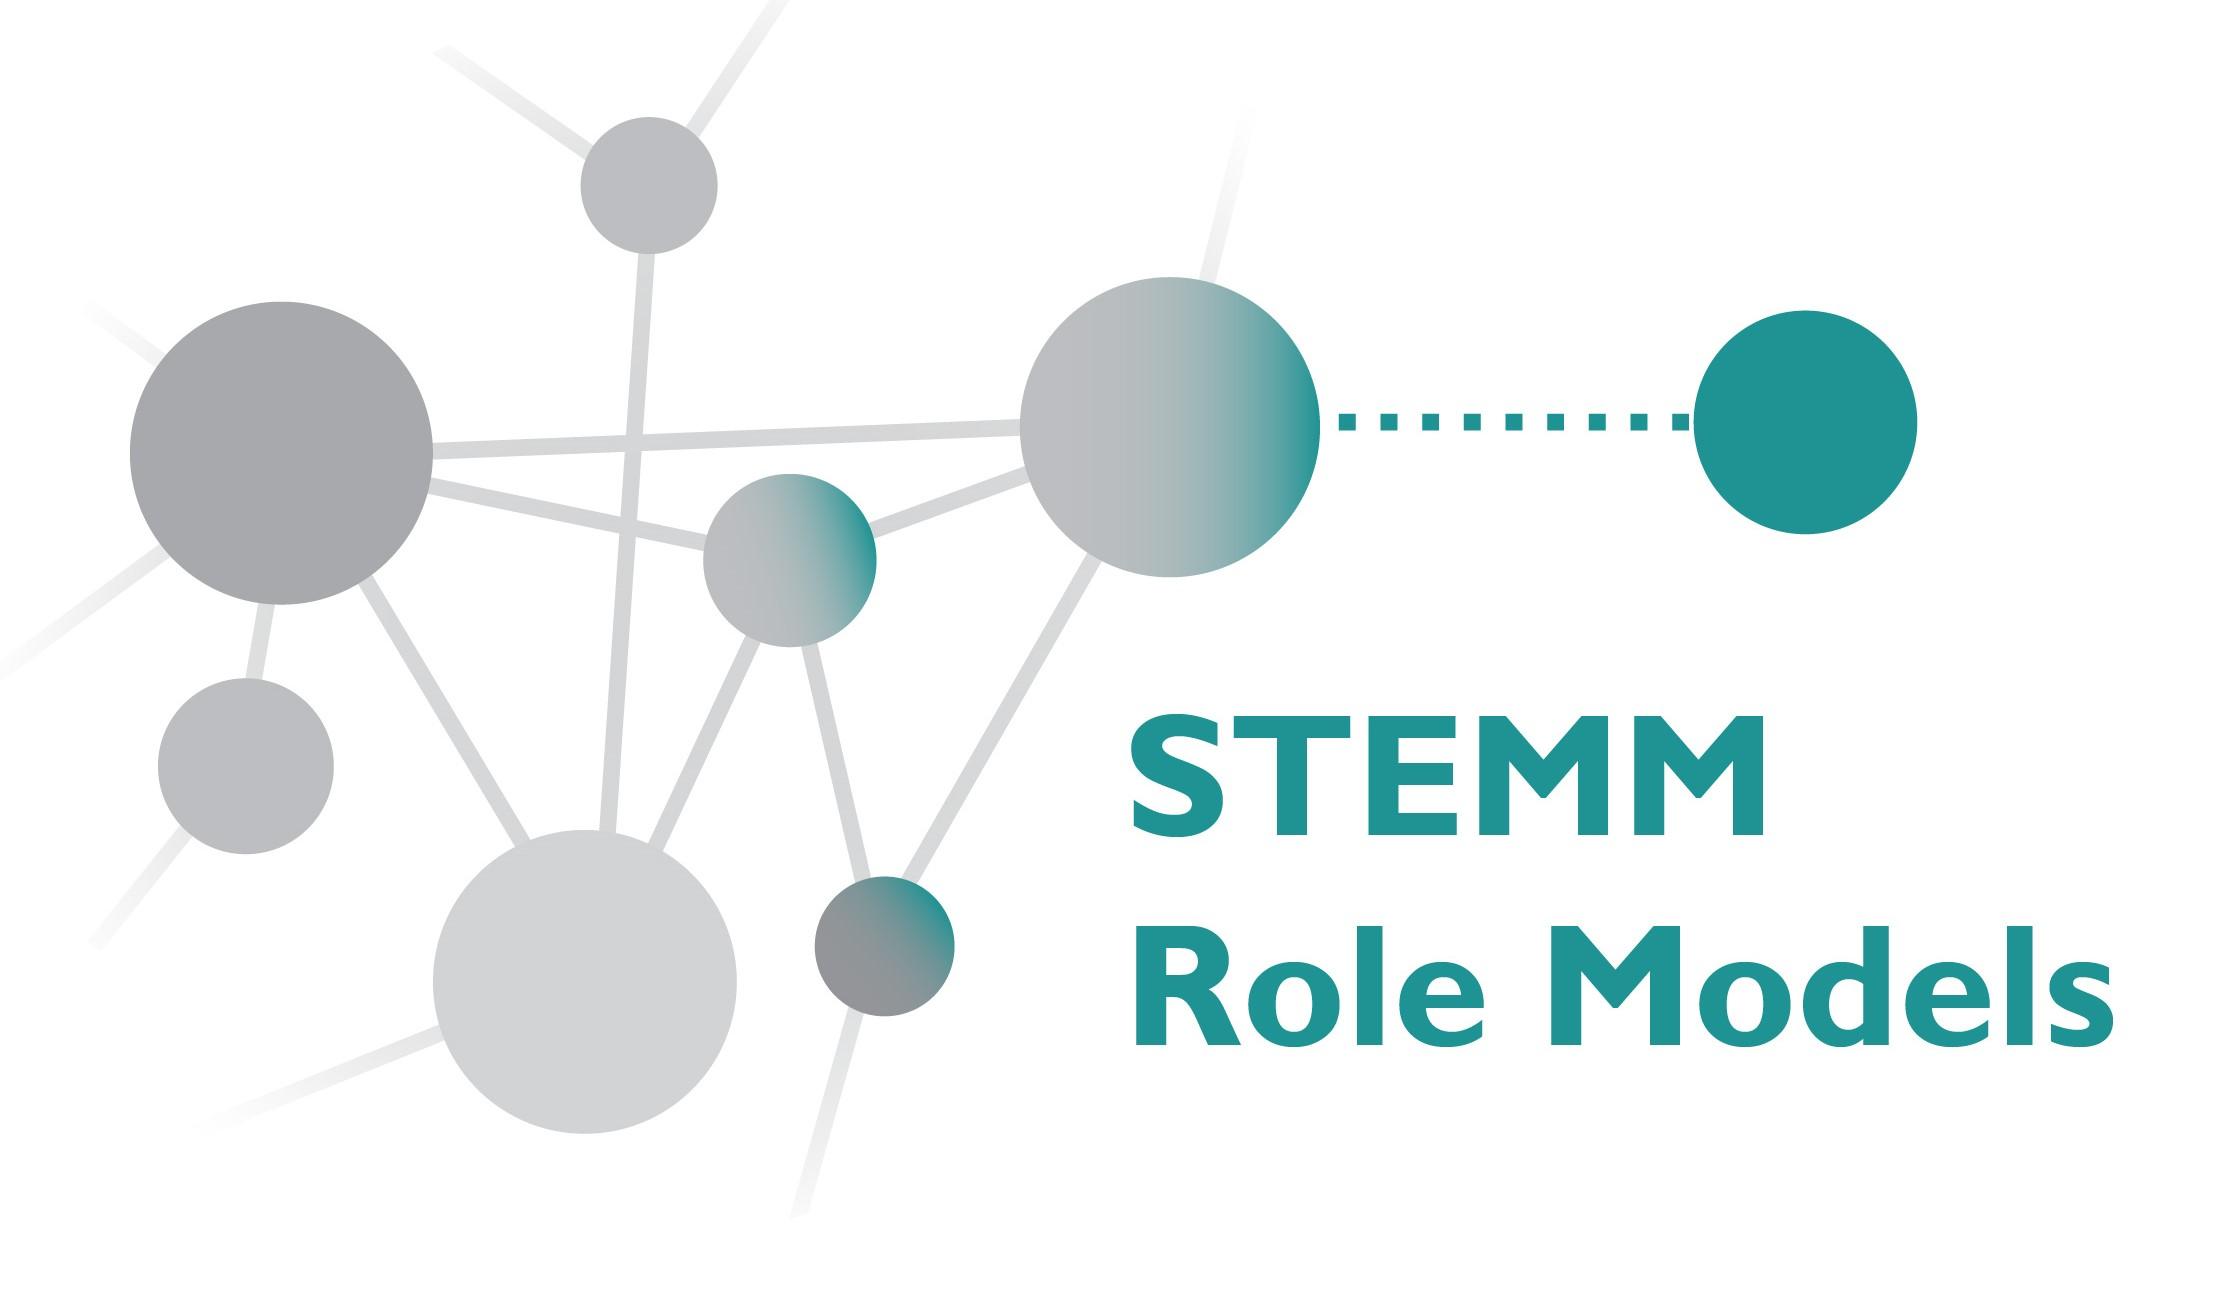 STEMM role models logo